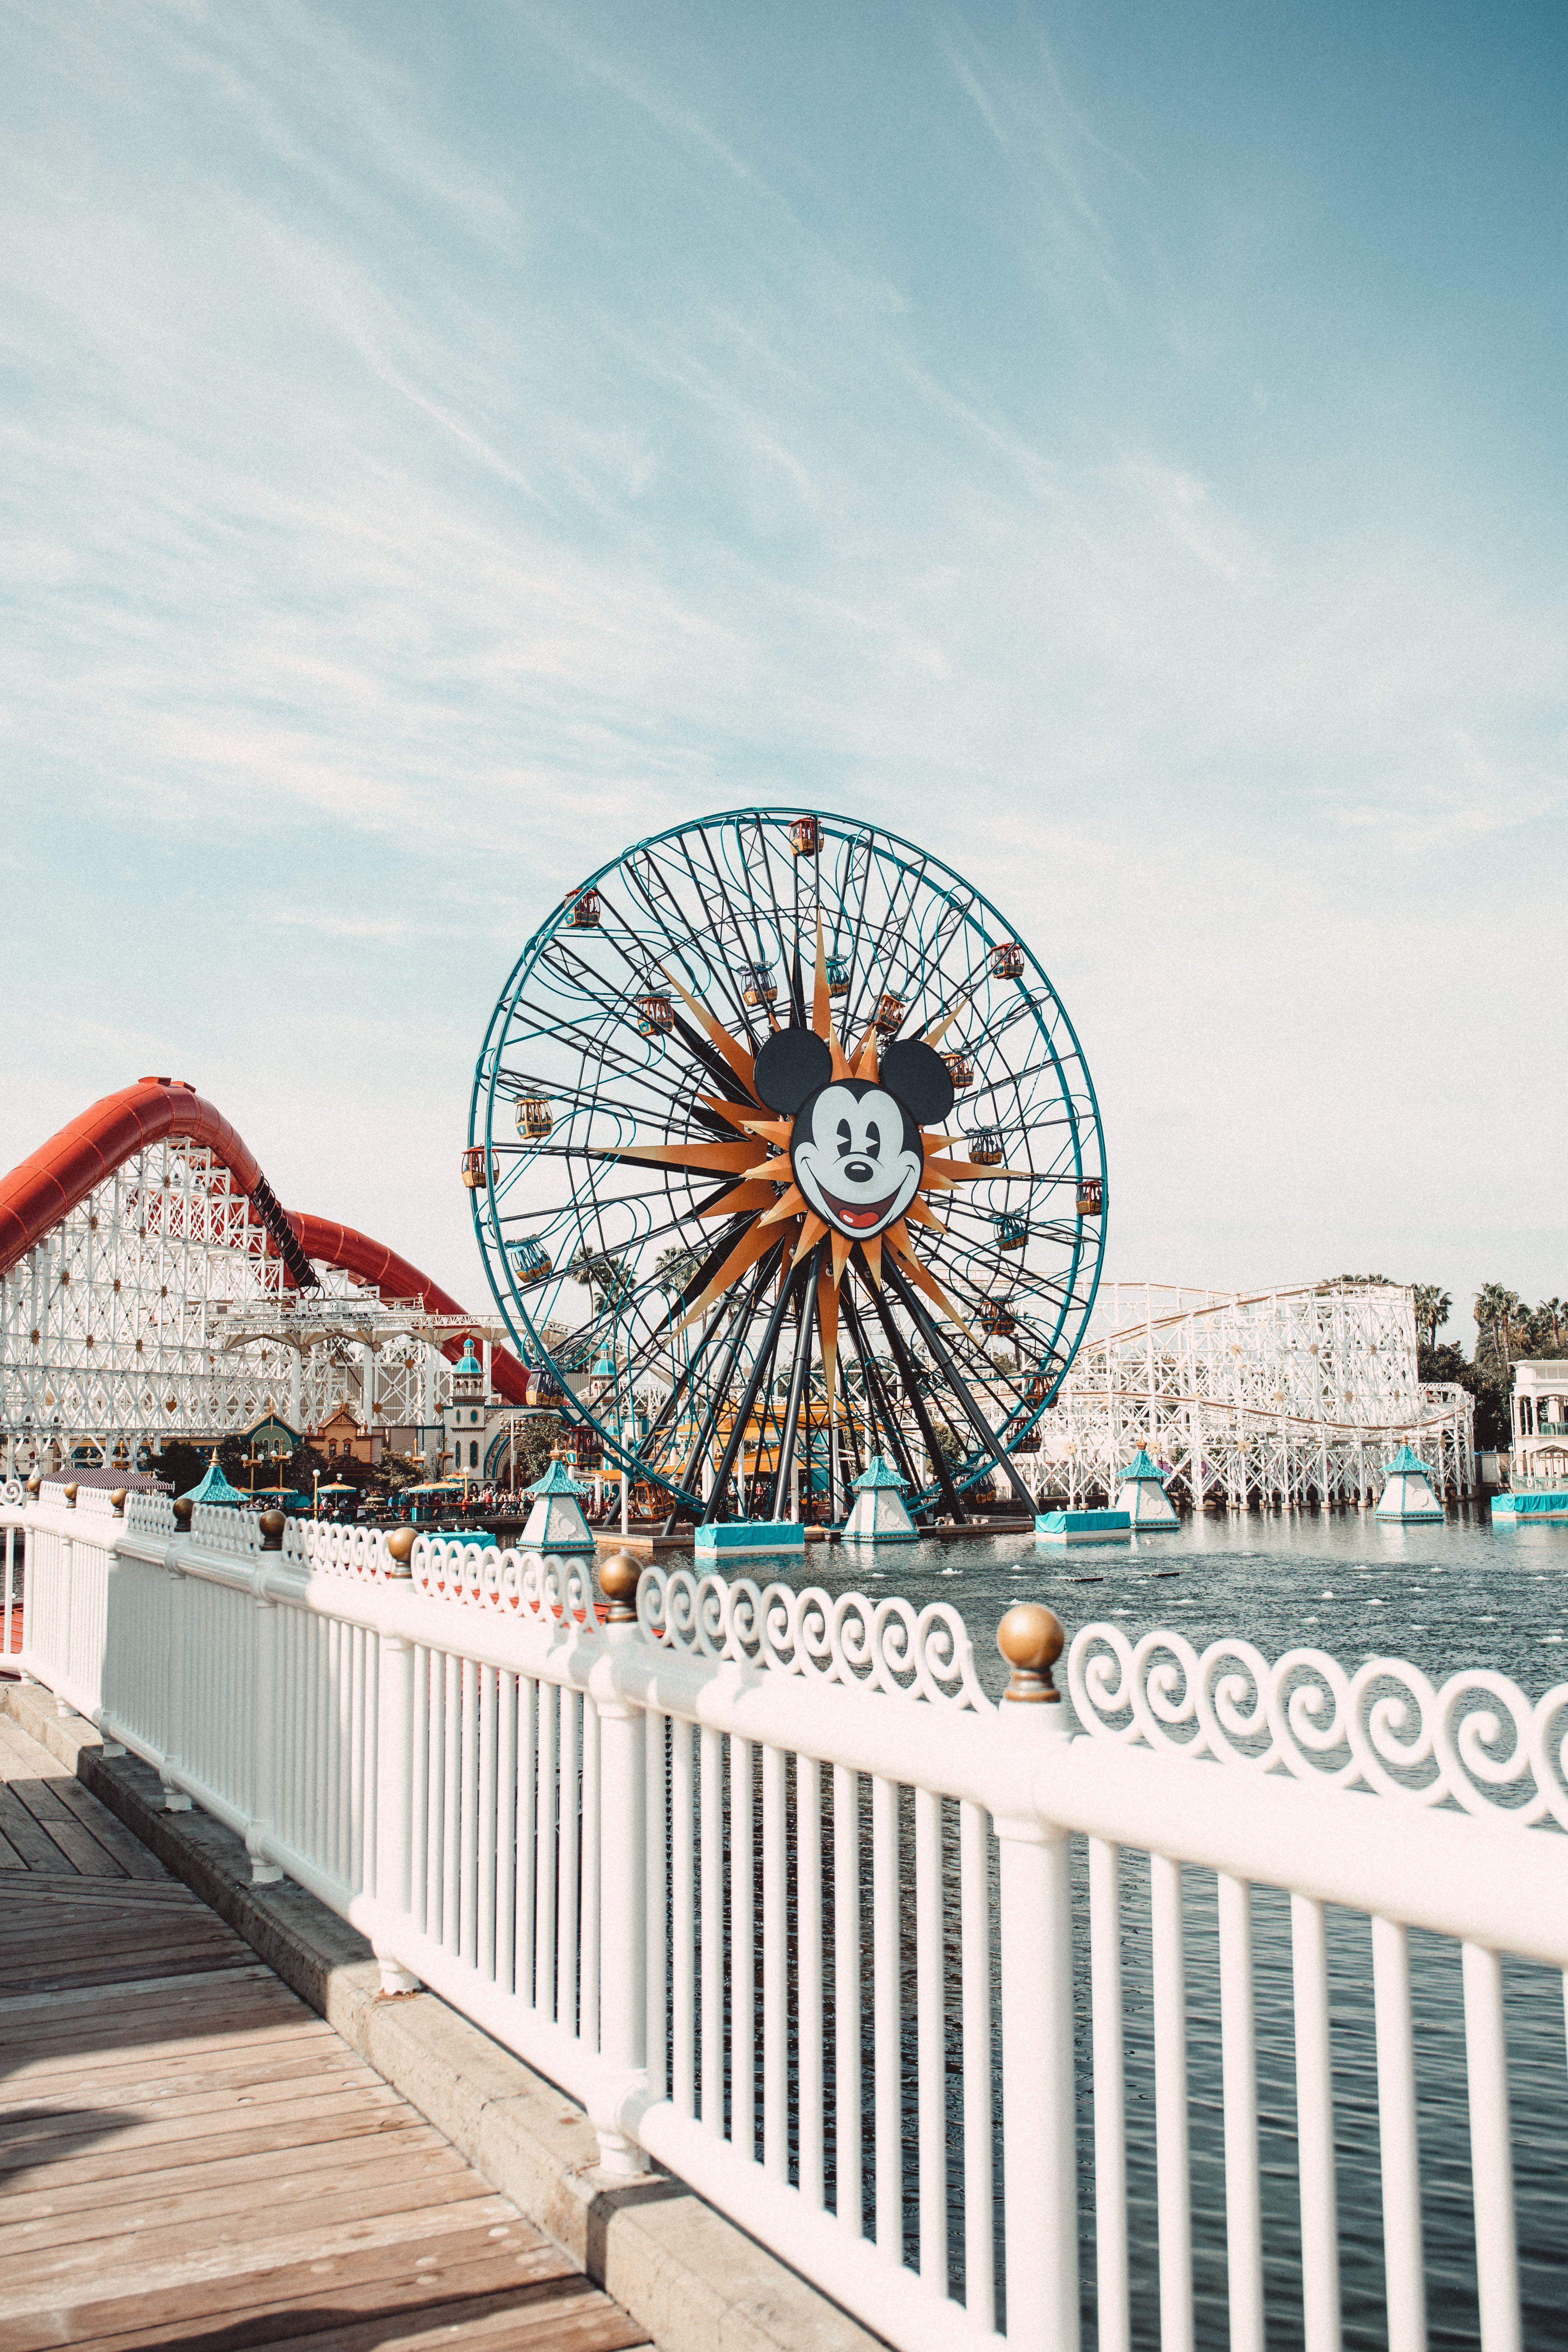 Pixar Pier Disney Pictures Cute Disney Pictures Disney Photography Fence ferris wheel 4k hd photography